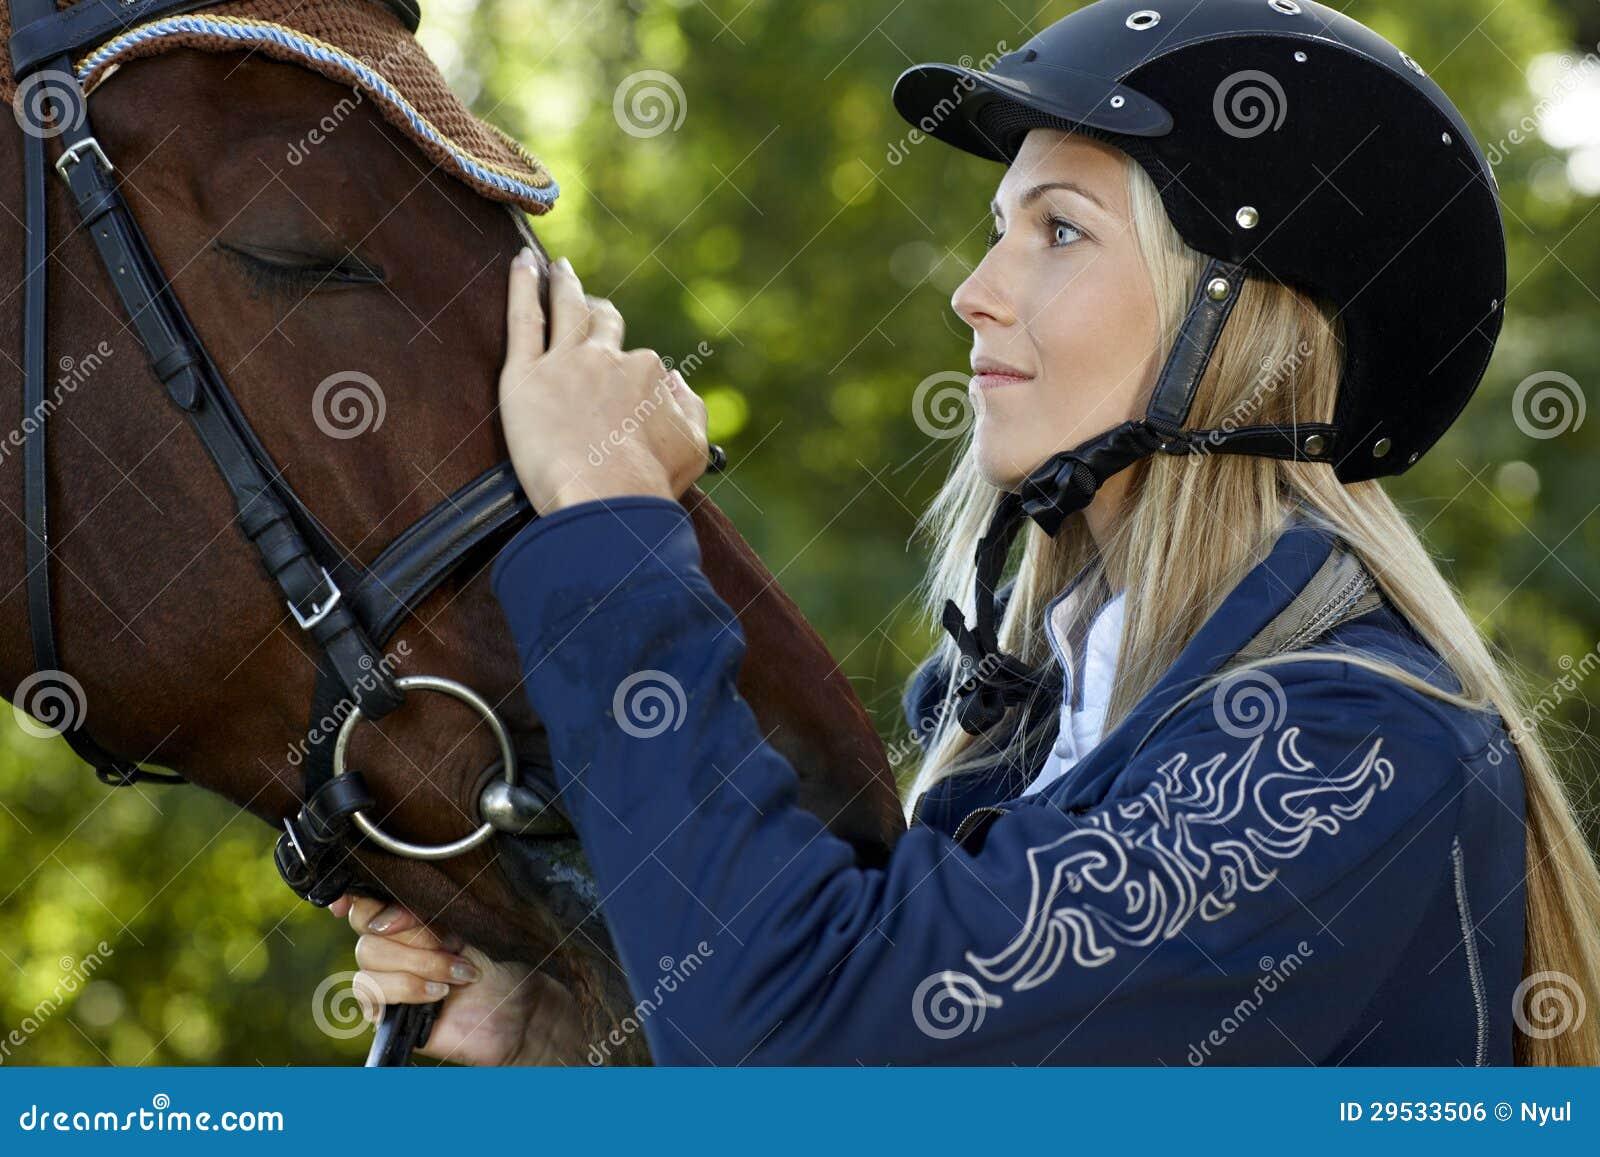 Amizade entre o cavaleiro e o cavalo